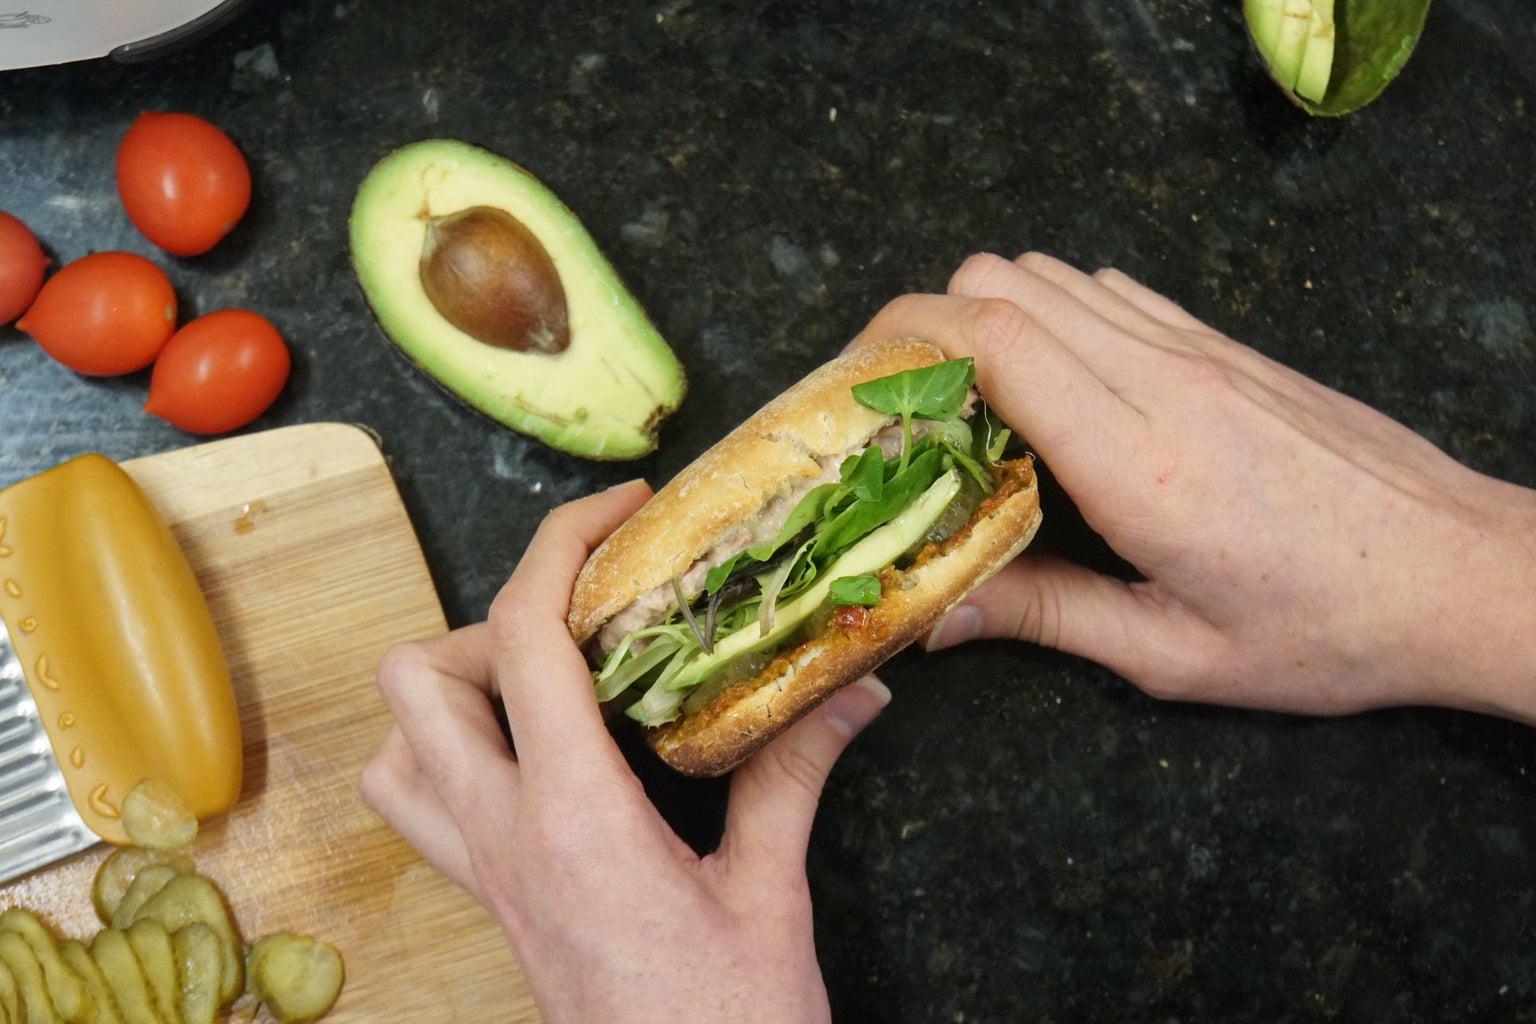 Assemble the Sandwiches